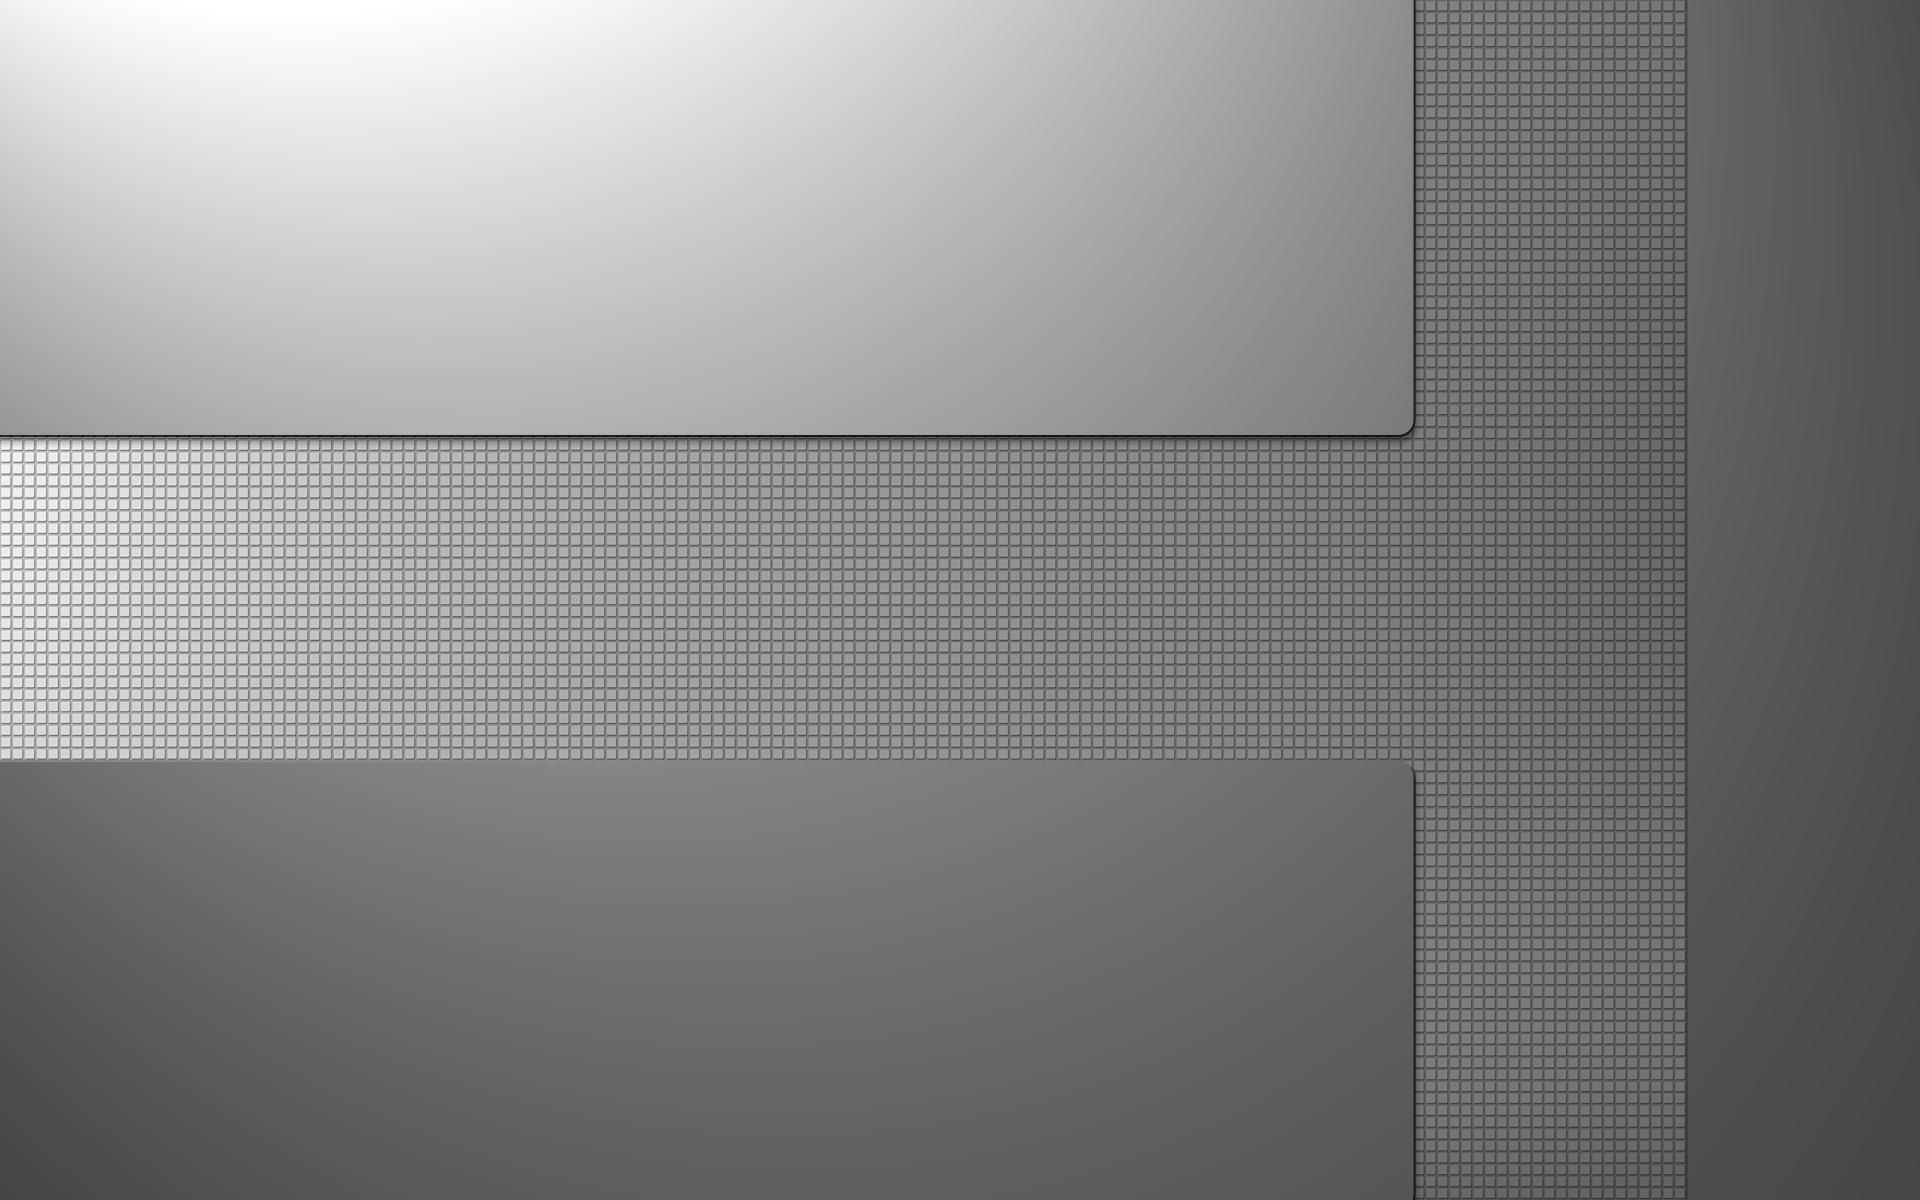 windows 2010 wallpapers download